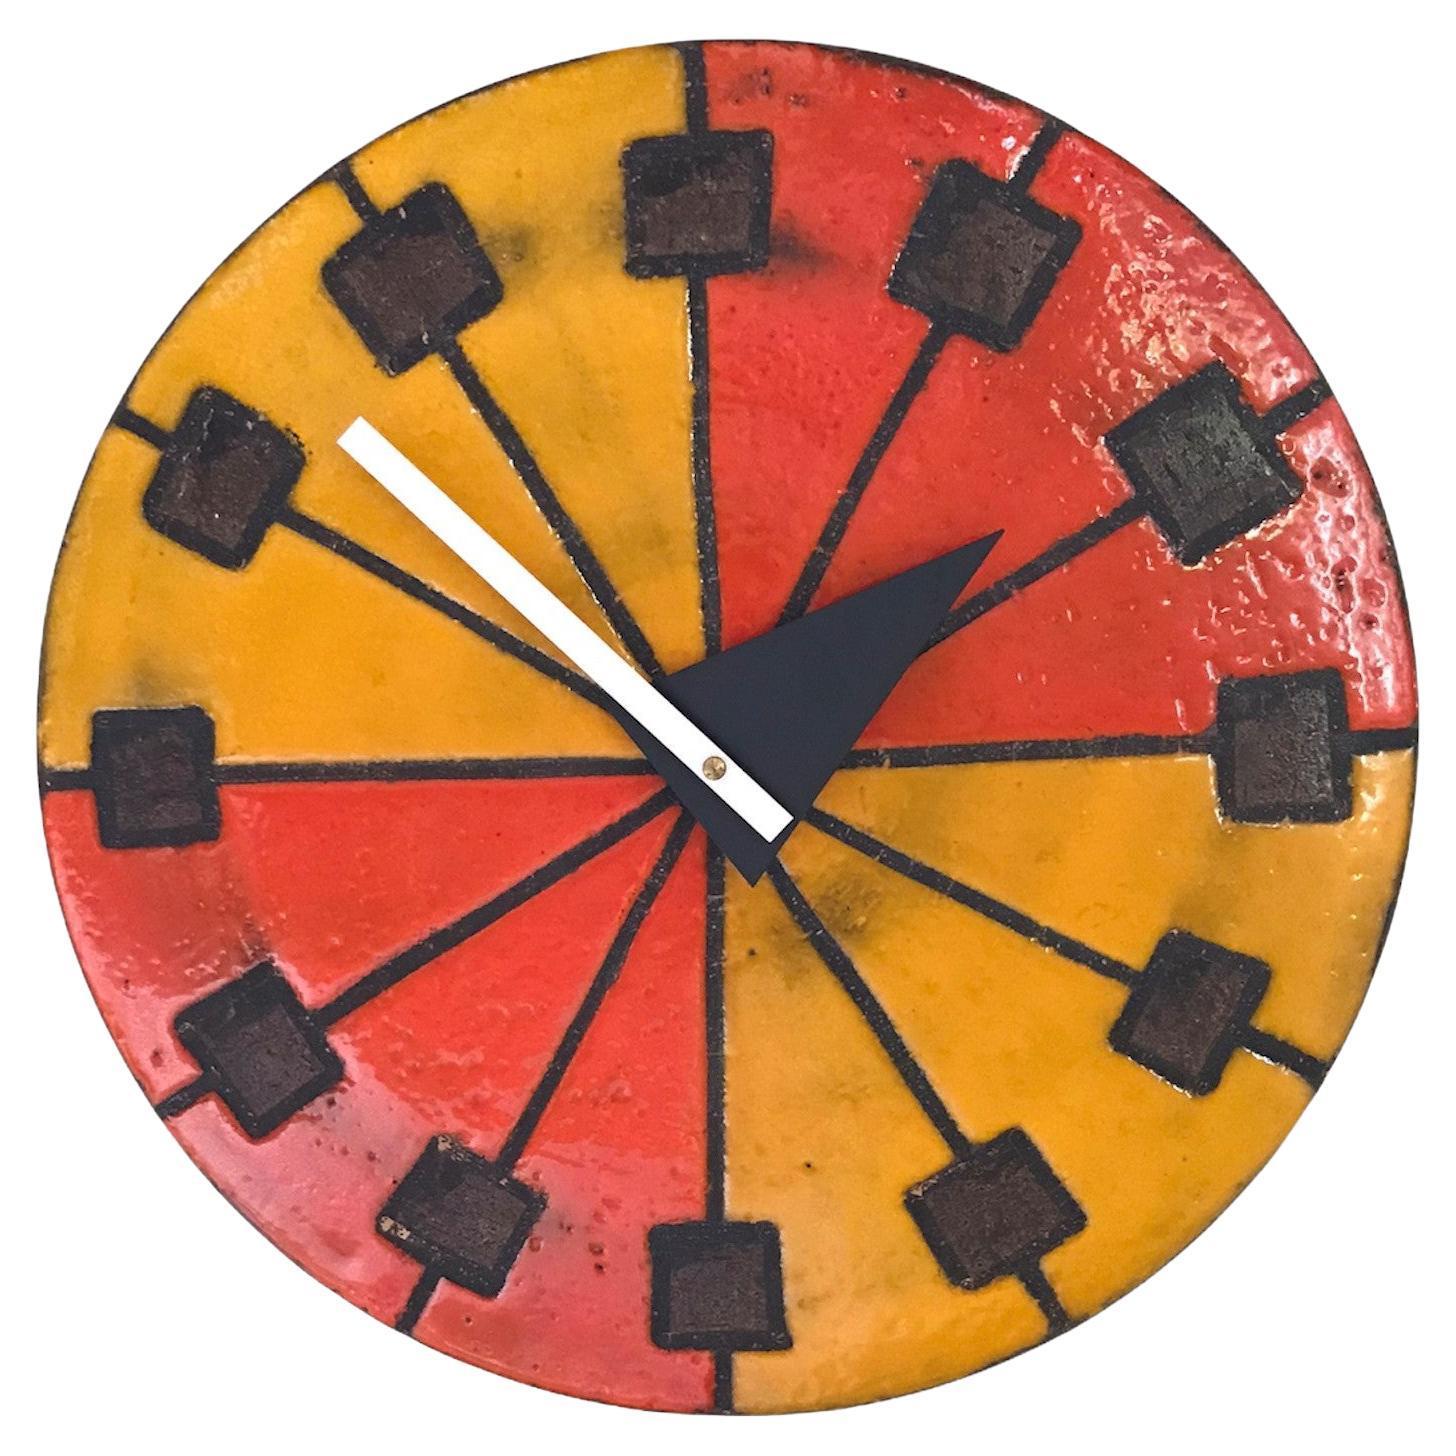 Meridian Italian Modern Ceramic Wall Clock by Bitossi for Howard Miller, 1963